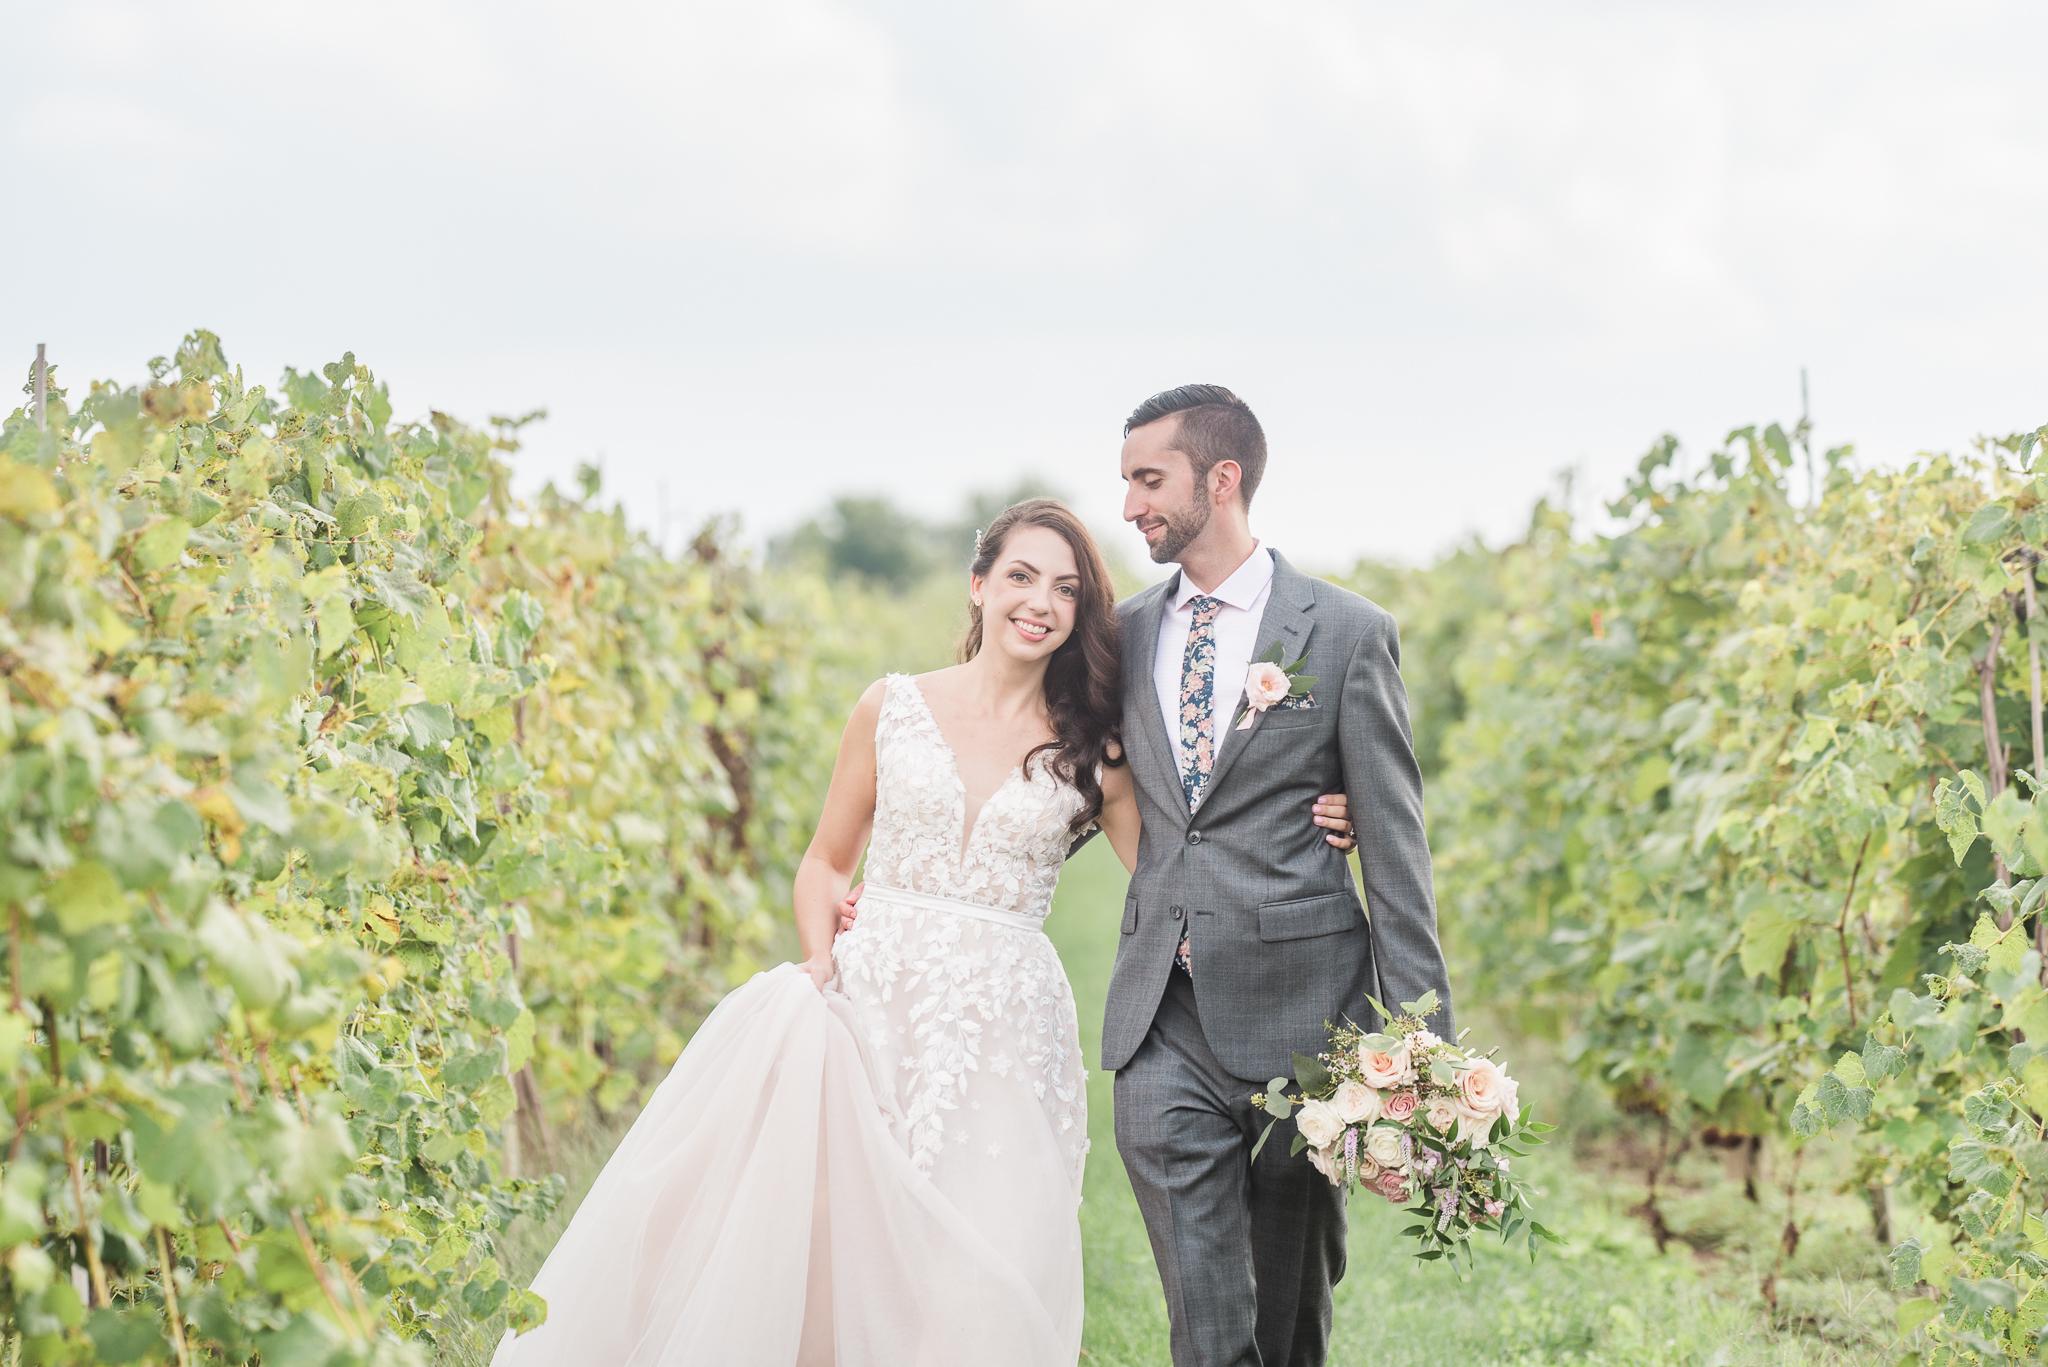 Sycamore at Mallow Run Wedding7130.jpg